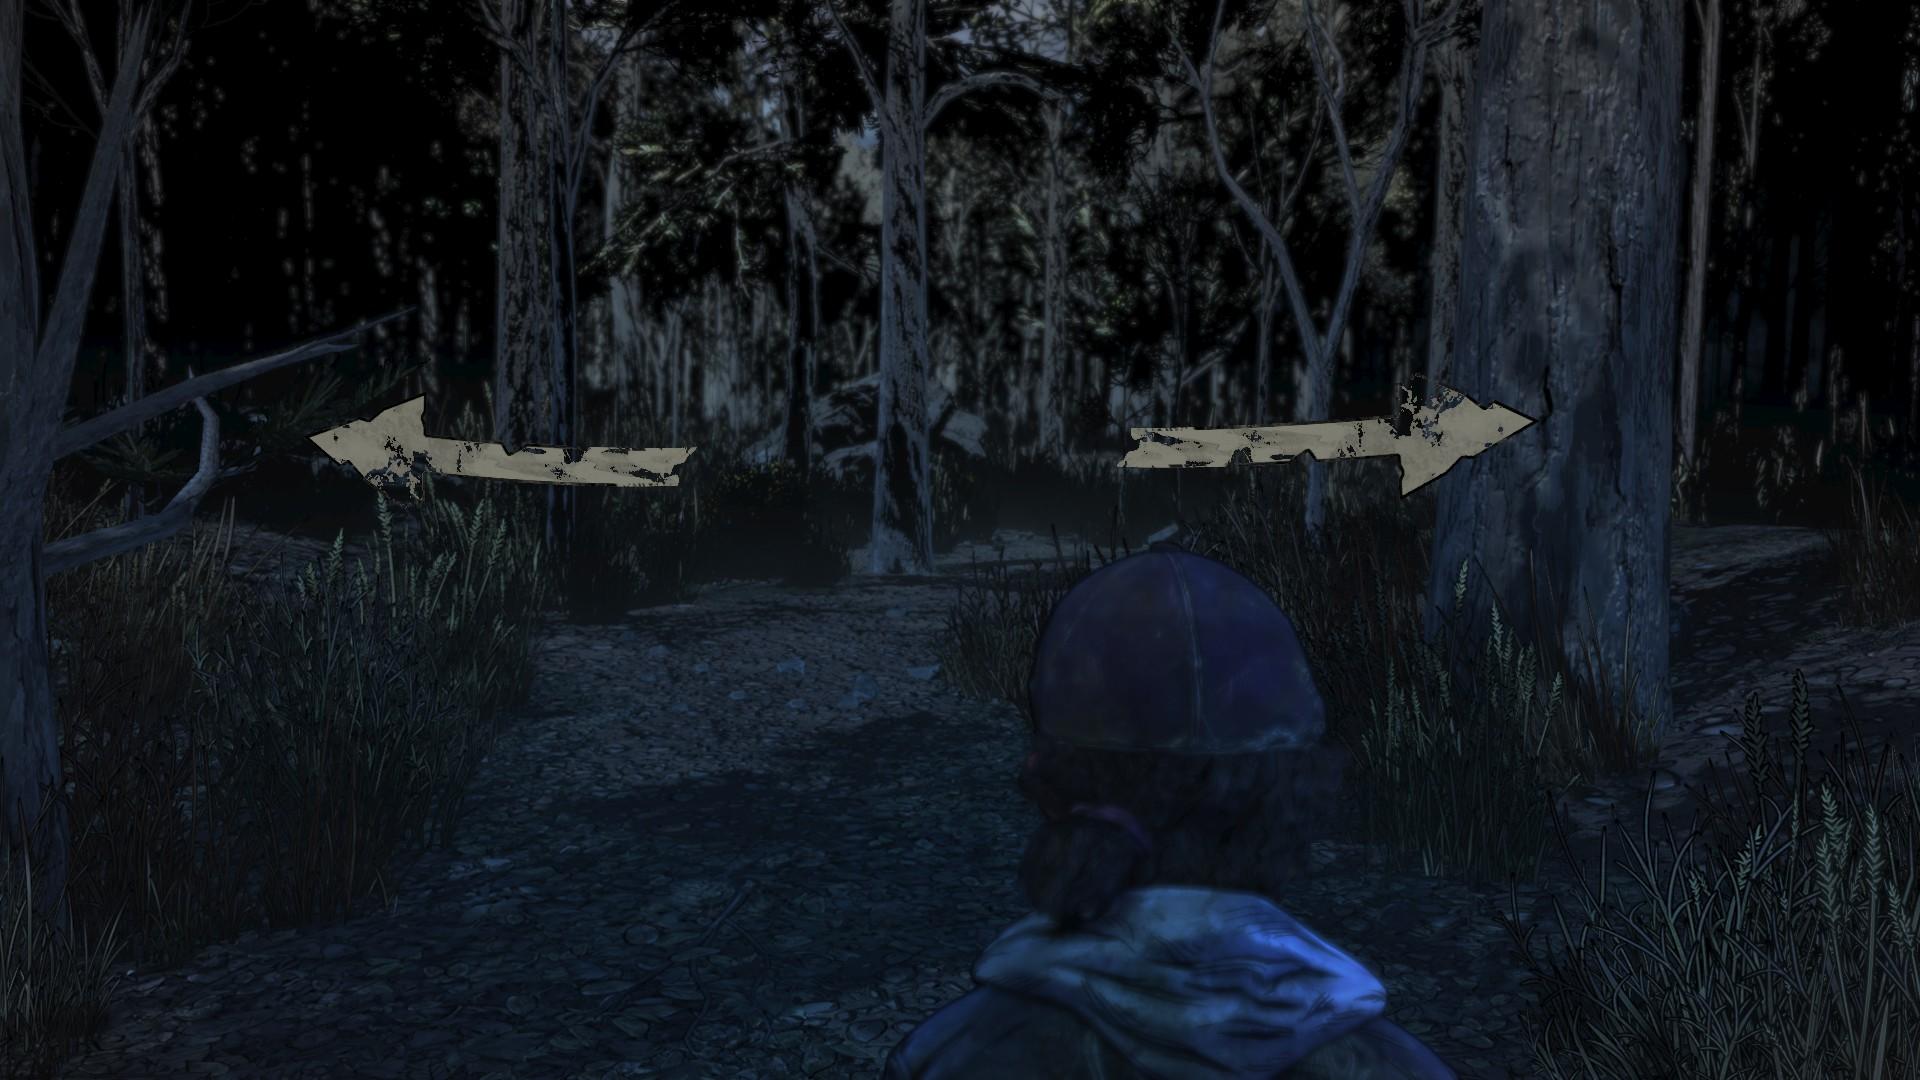 TheWalkingDeadL-UltimeSaison-Episode2-Lesenfantsperdus PC Test 006